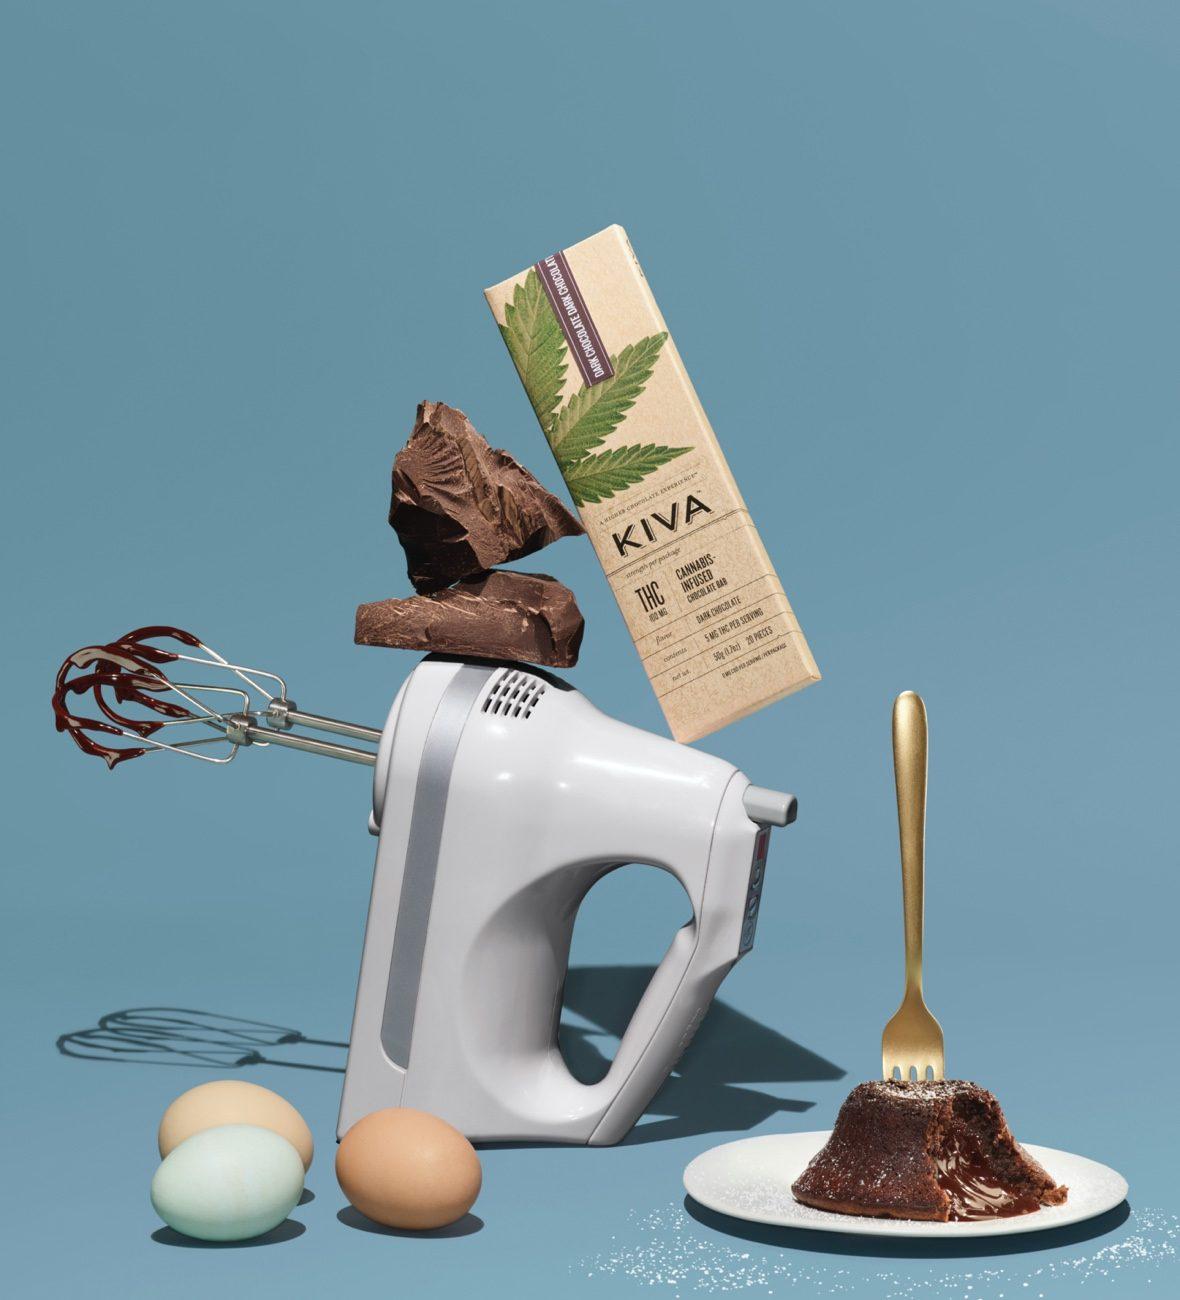 20191204 Blog Kiva Dark Chocolate Molten Lava Cake 1180x1300